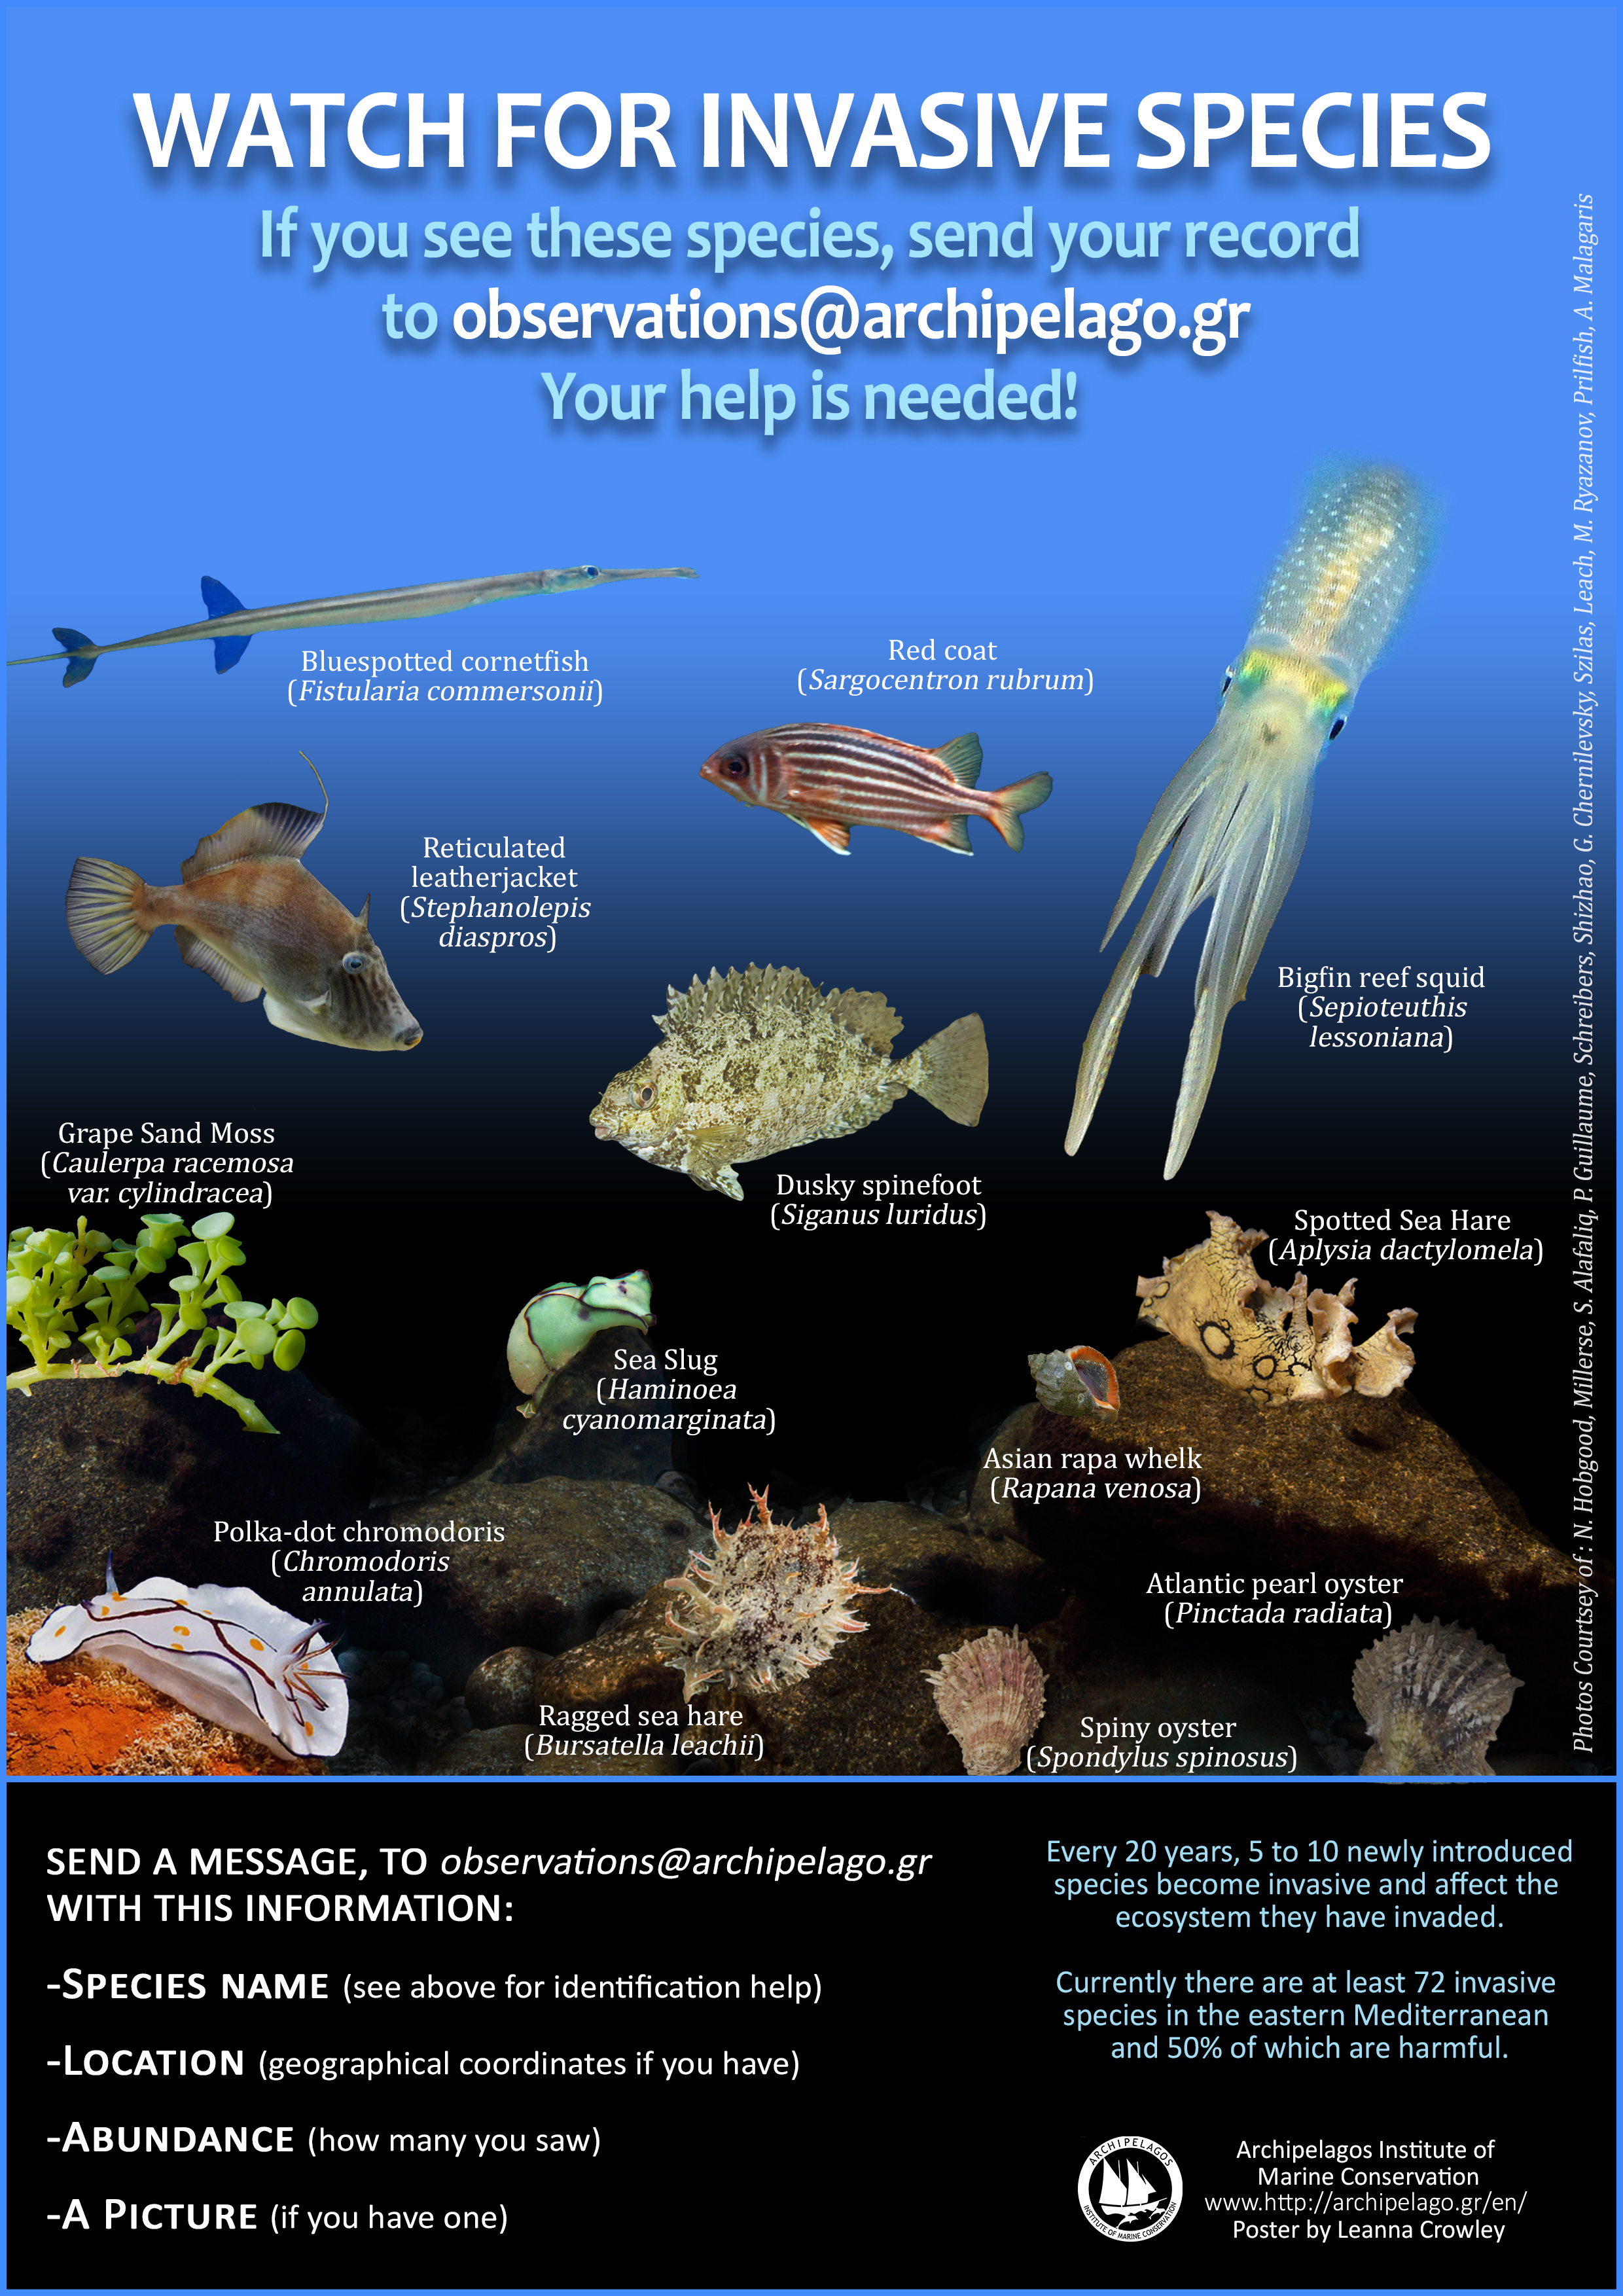 Aquatic Invasive Species   Whatcom Boat Inspections